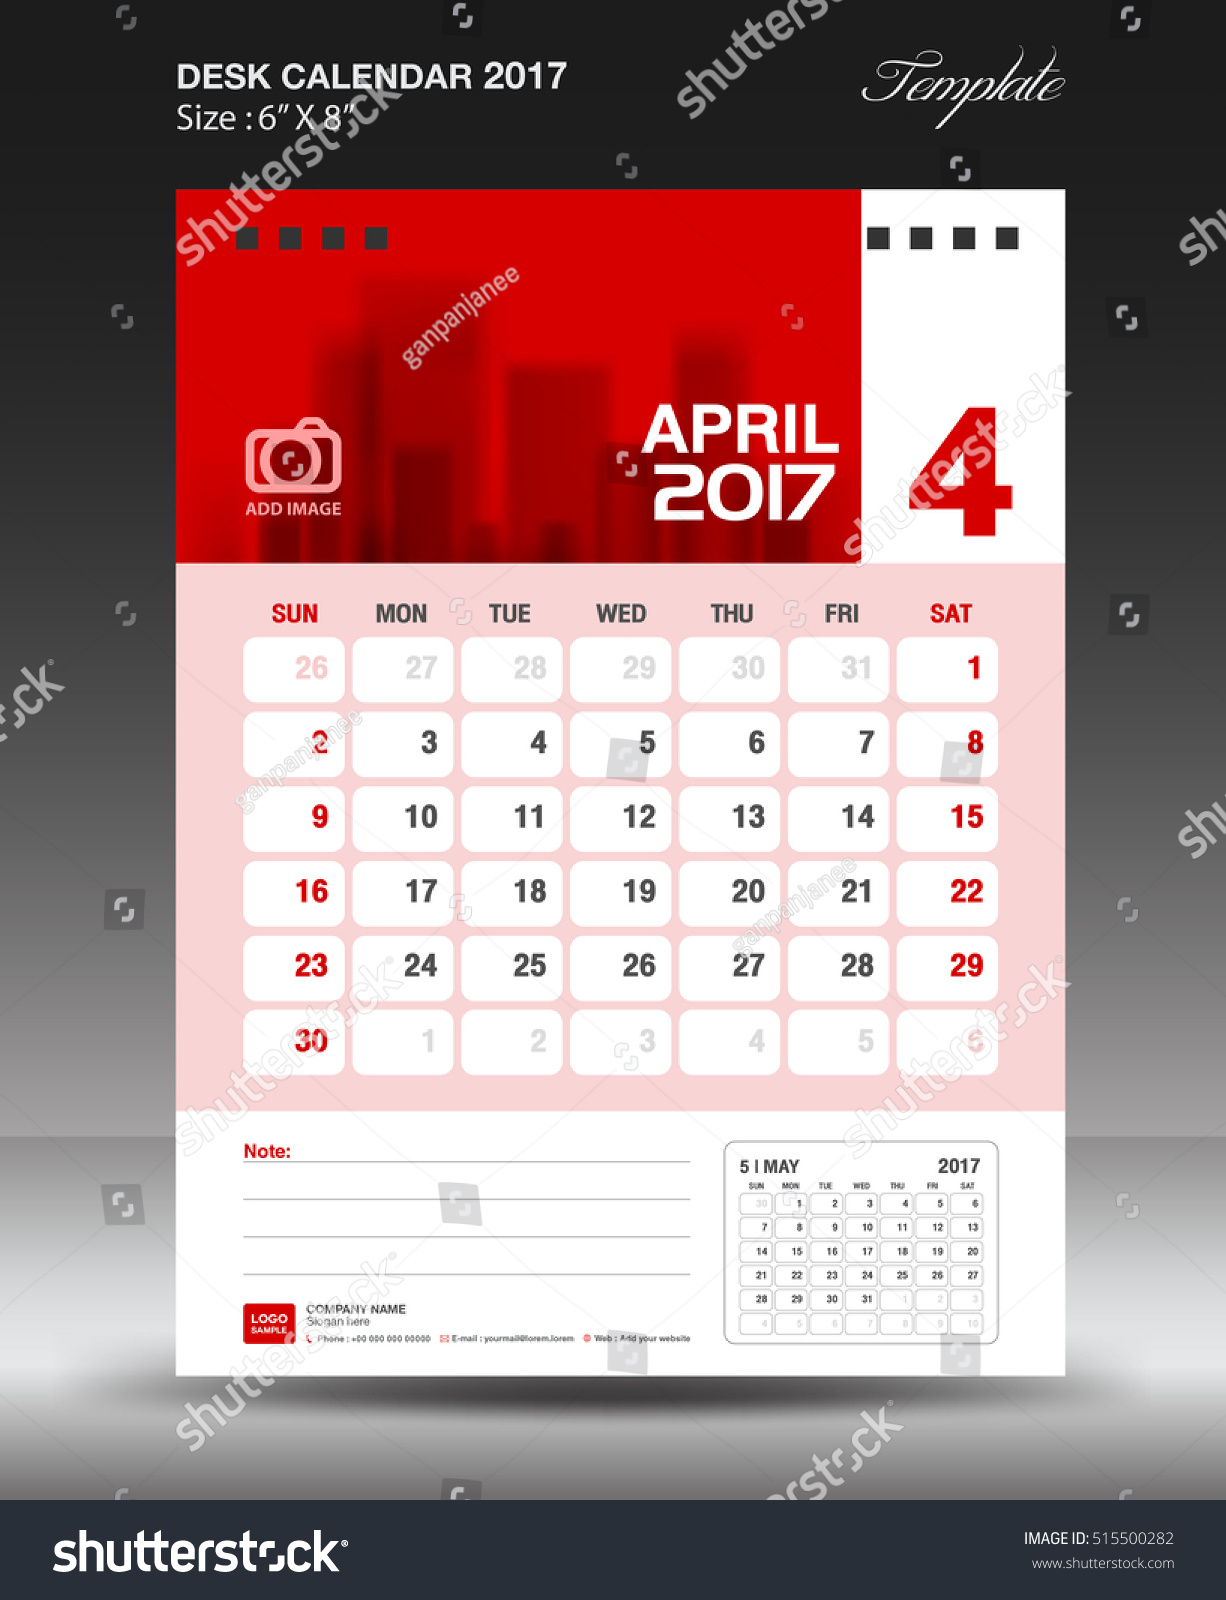 Table Calendar Size : April desk calendar year corporate business flyer